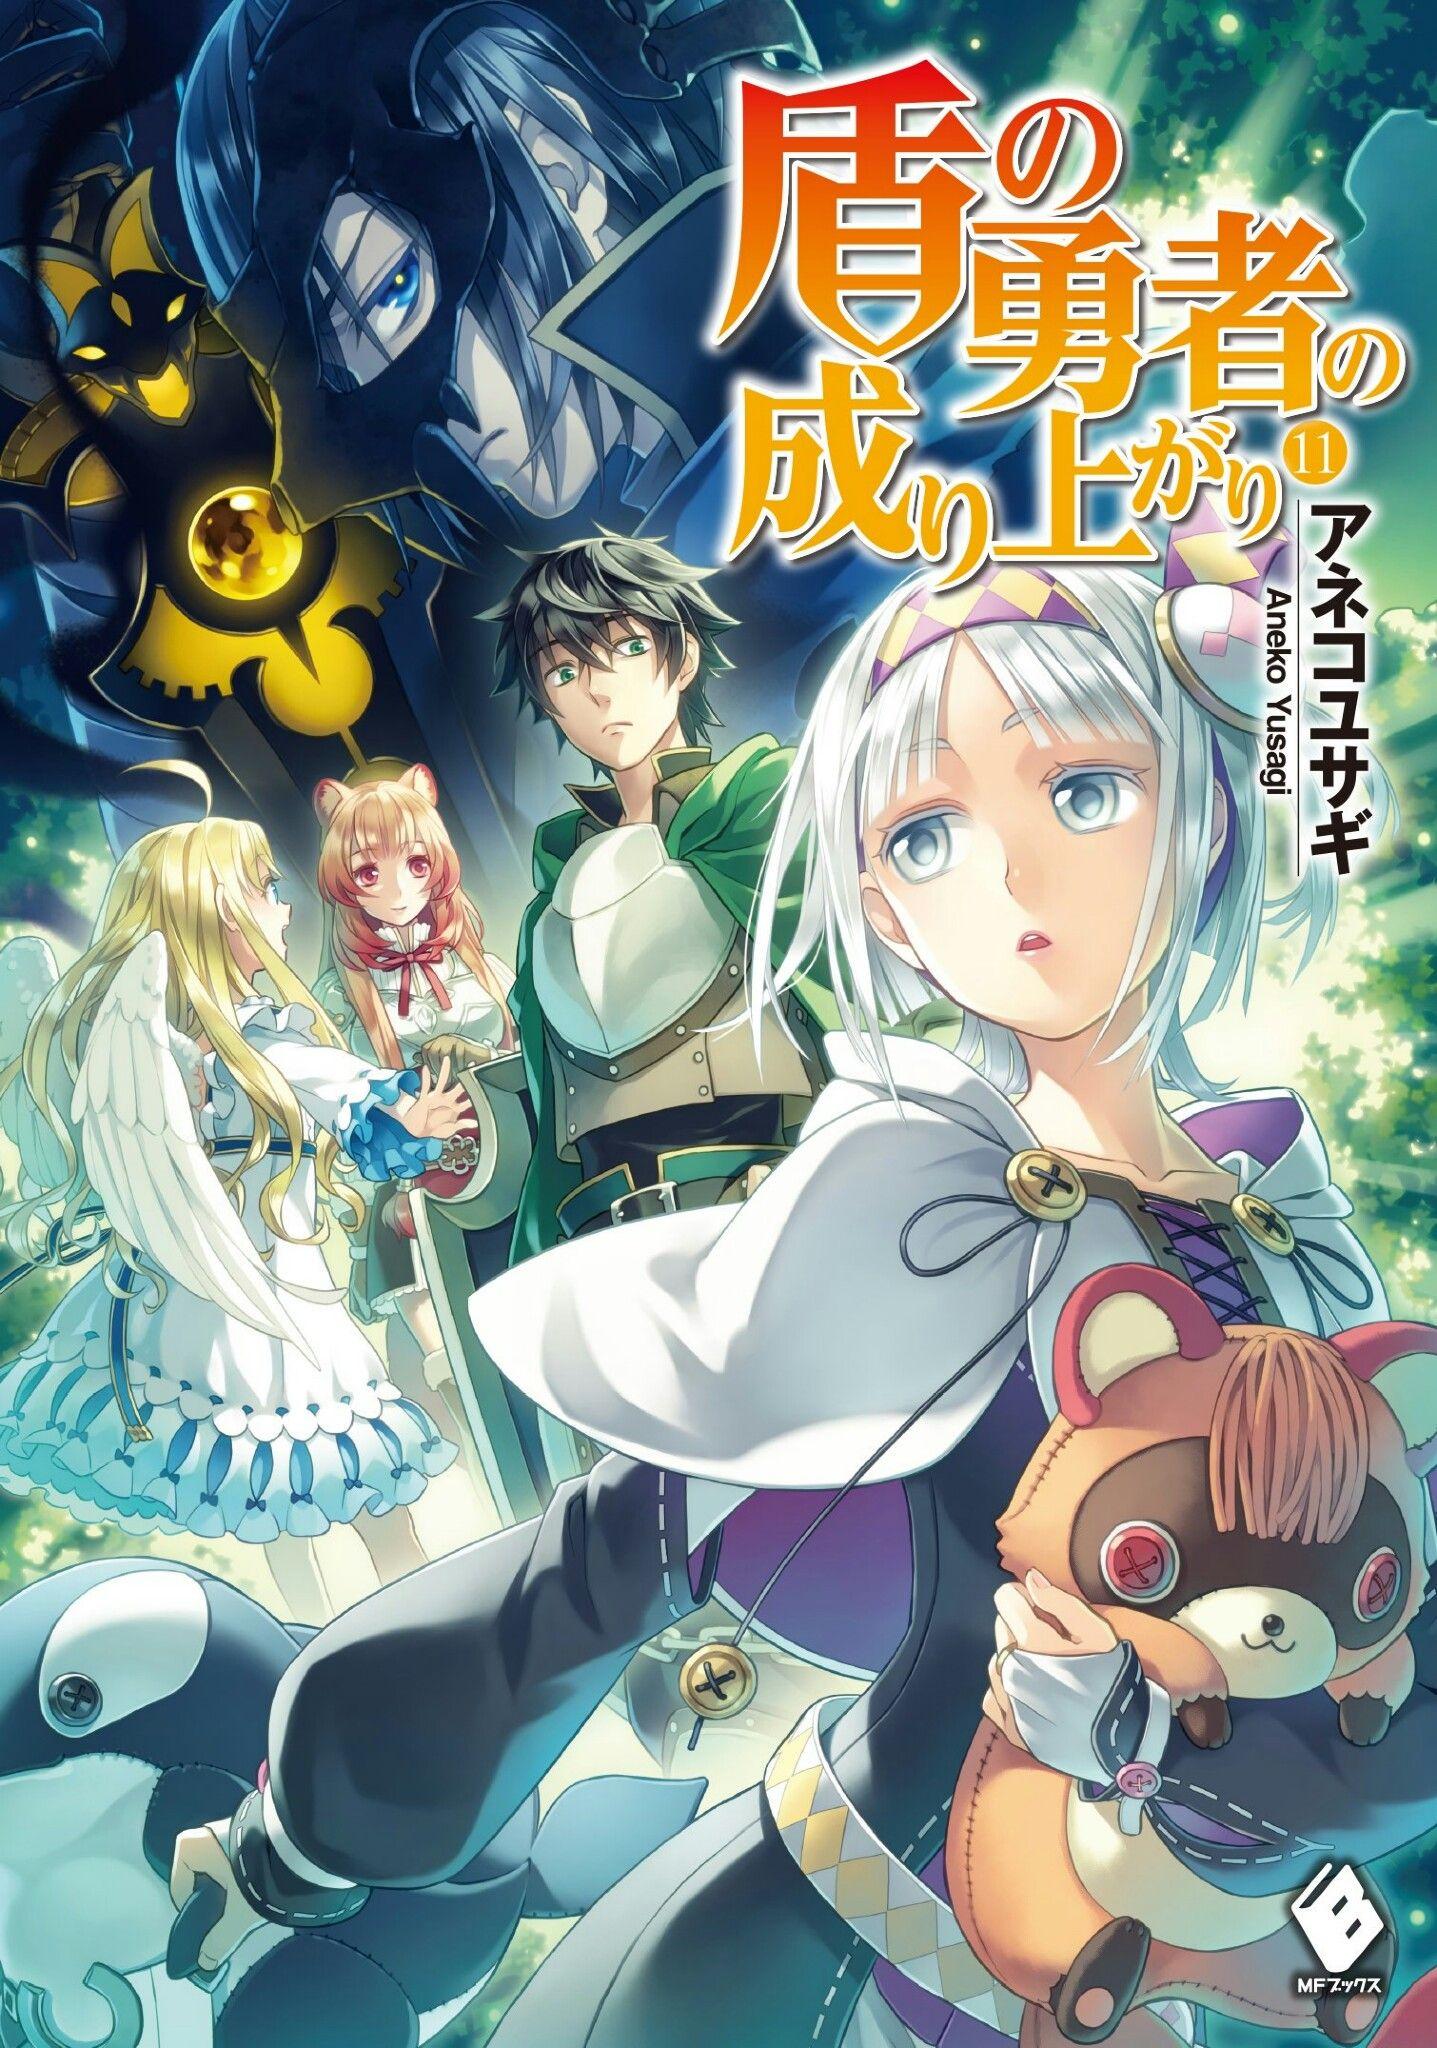 Pin By Tori On Animeat Light Novel Anime Hero